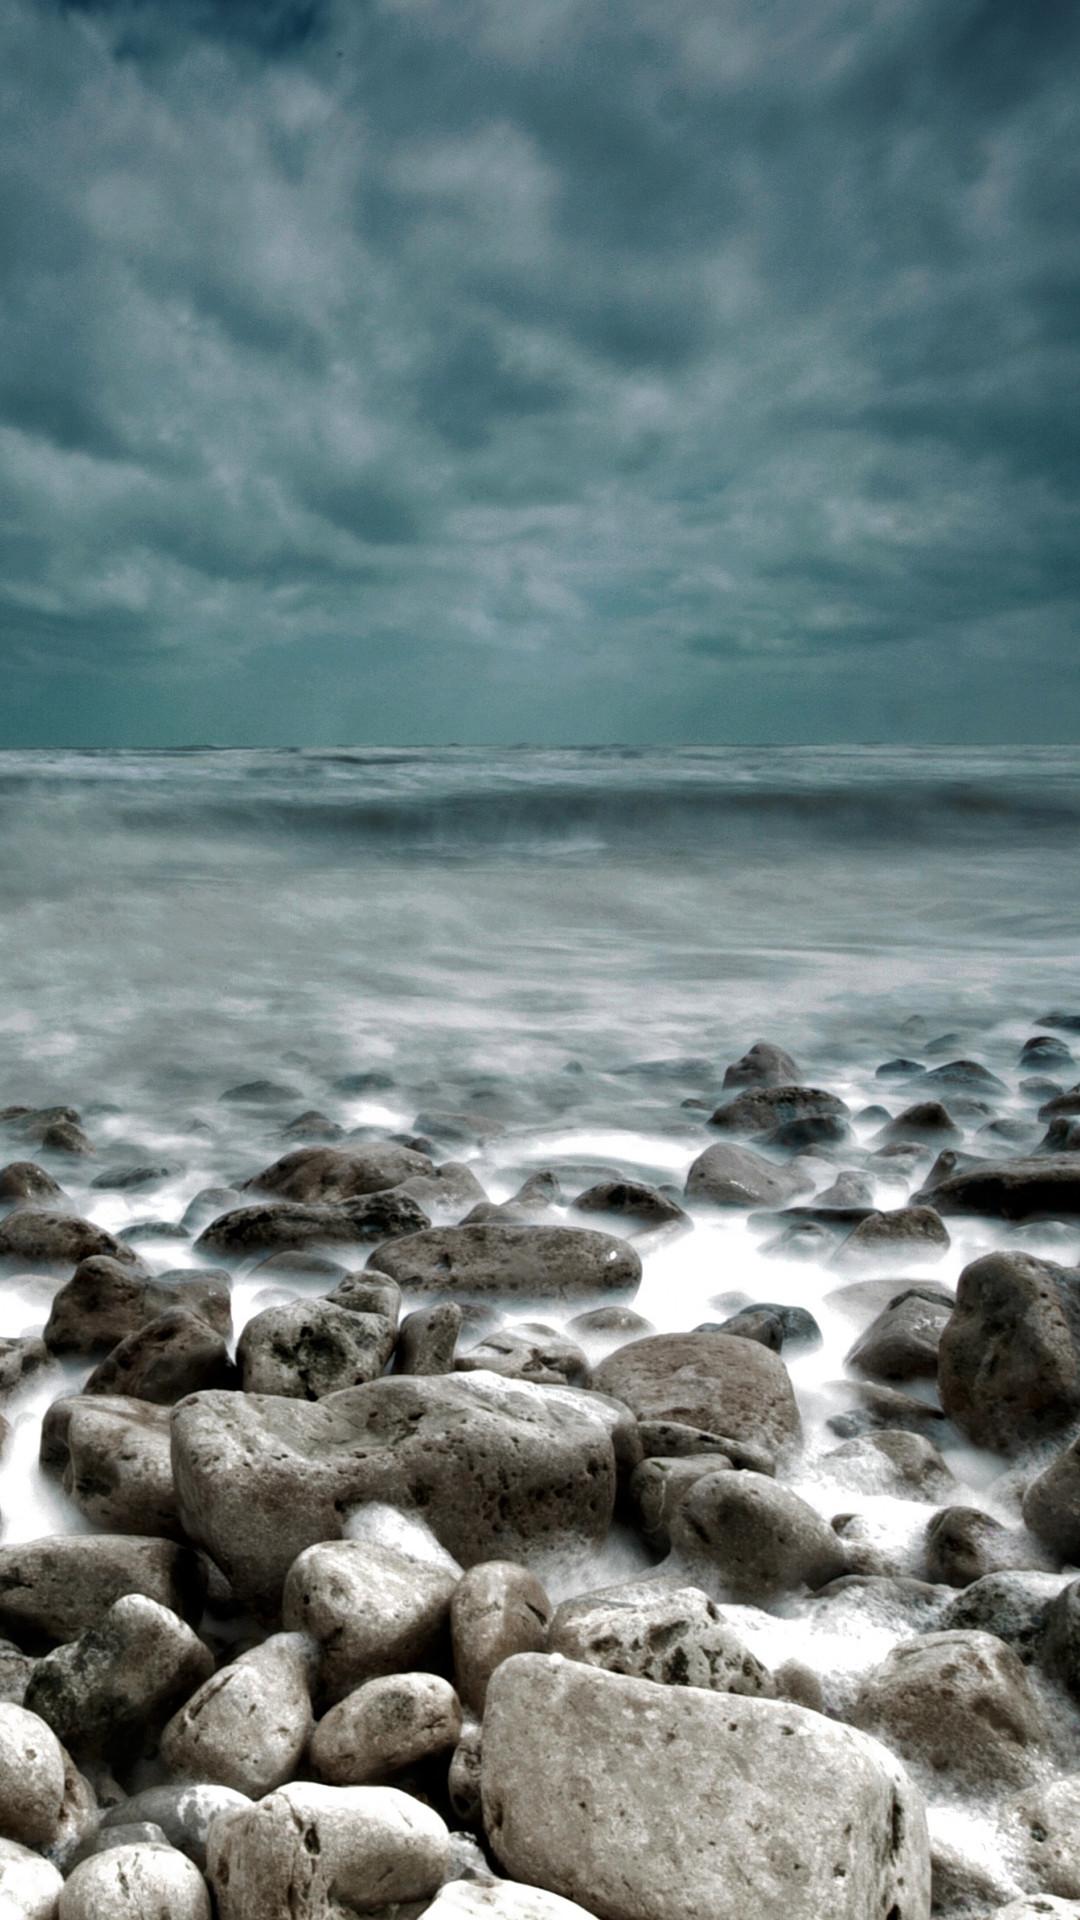 Rough Sea Rocks Waves Lockscreen Android Wallpaper …